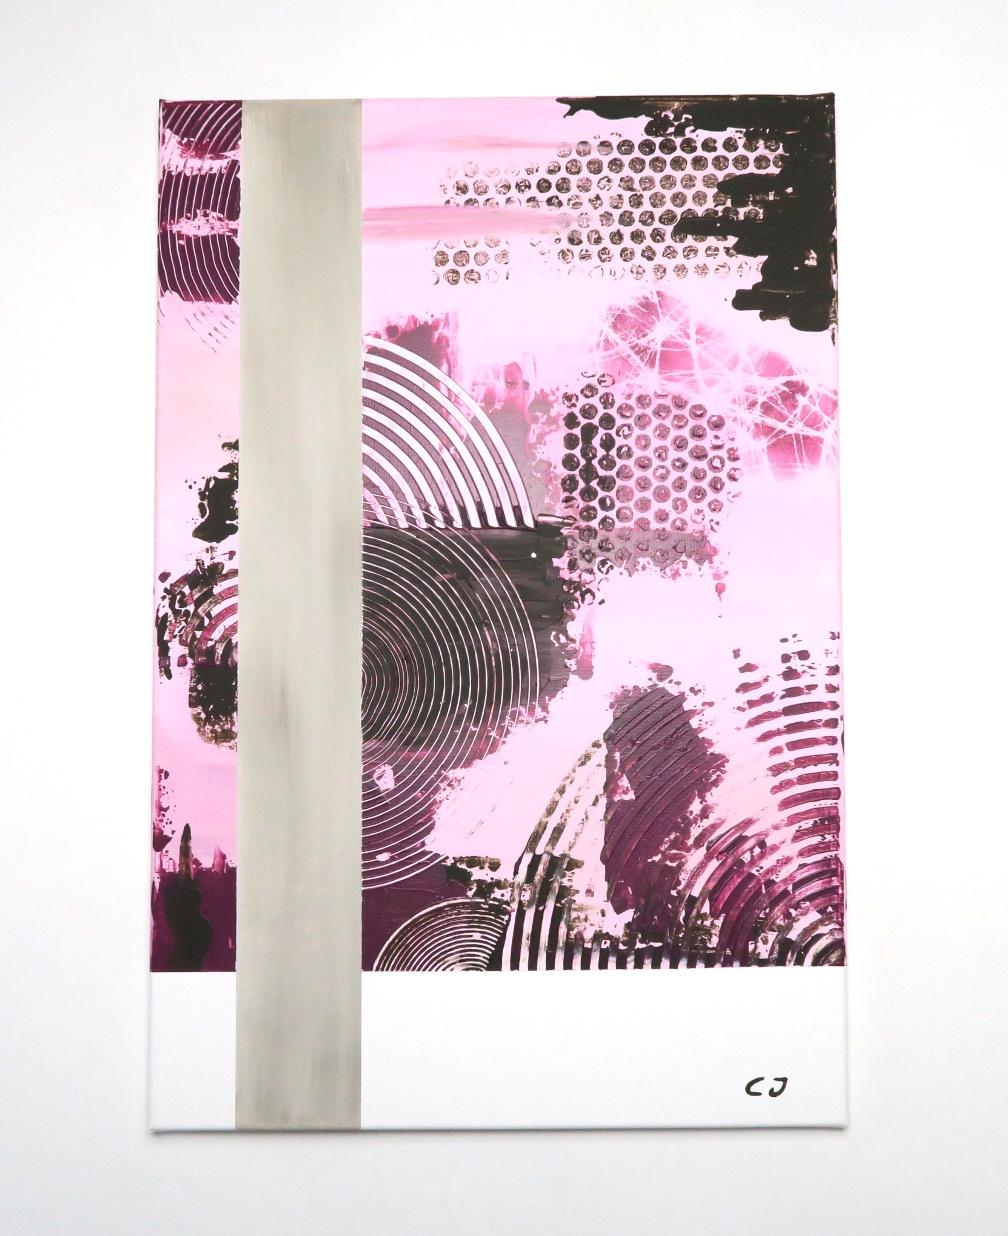 BecomeTheArtist - Galerie Art